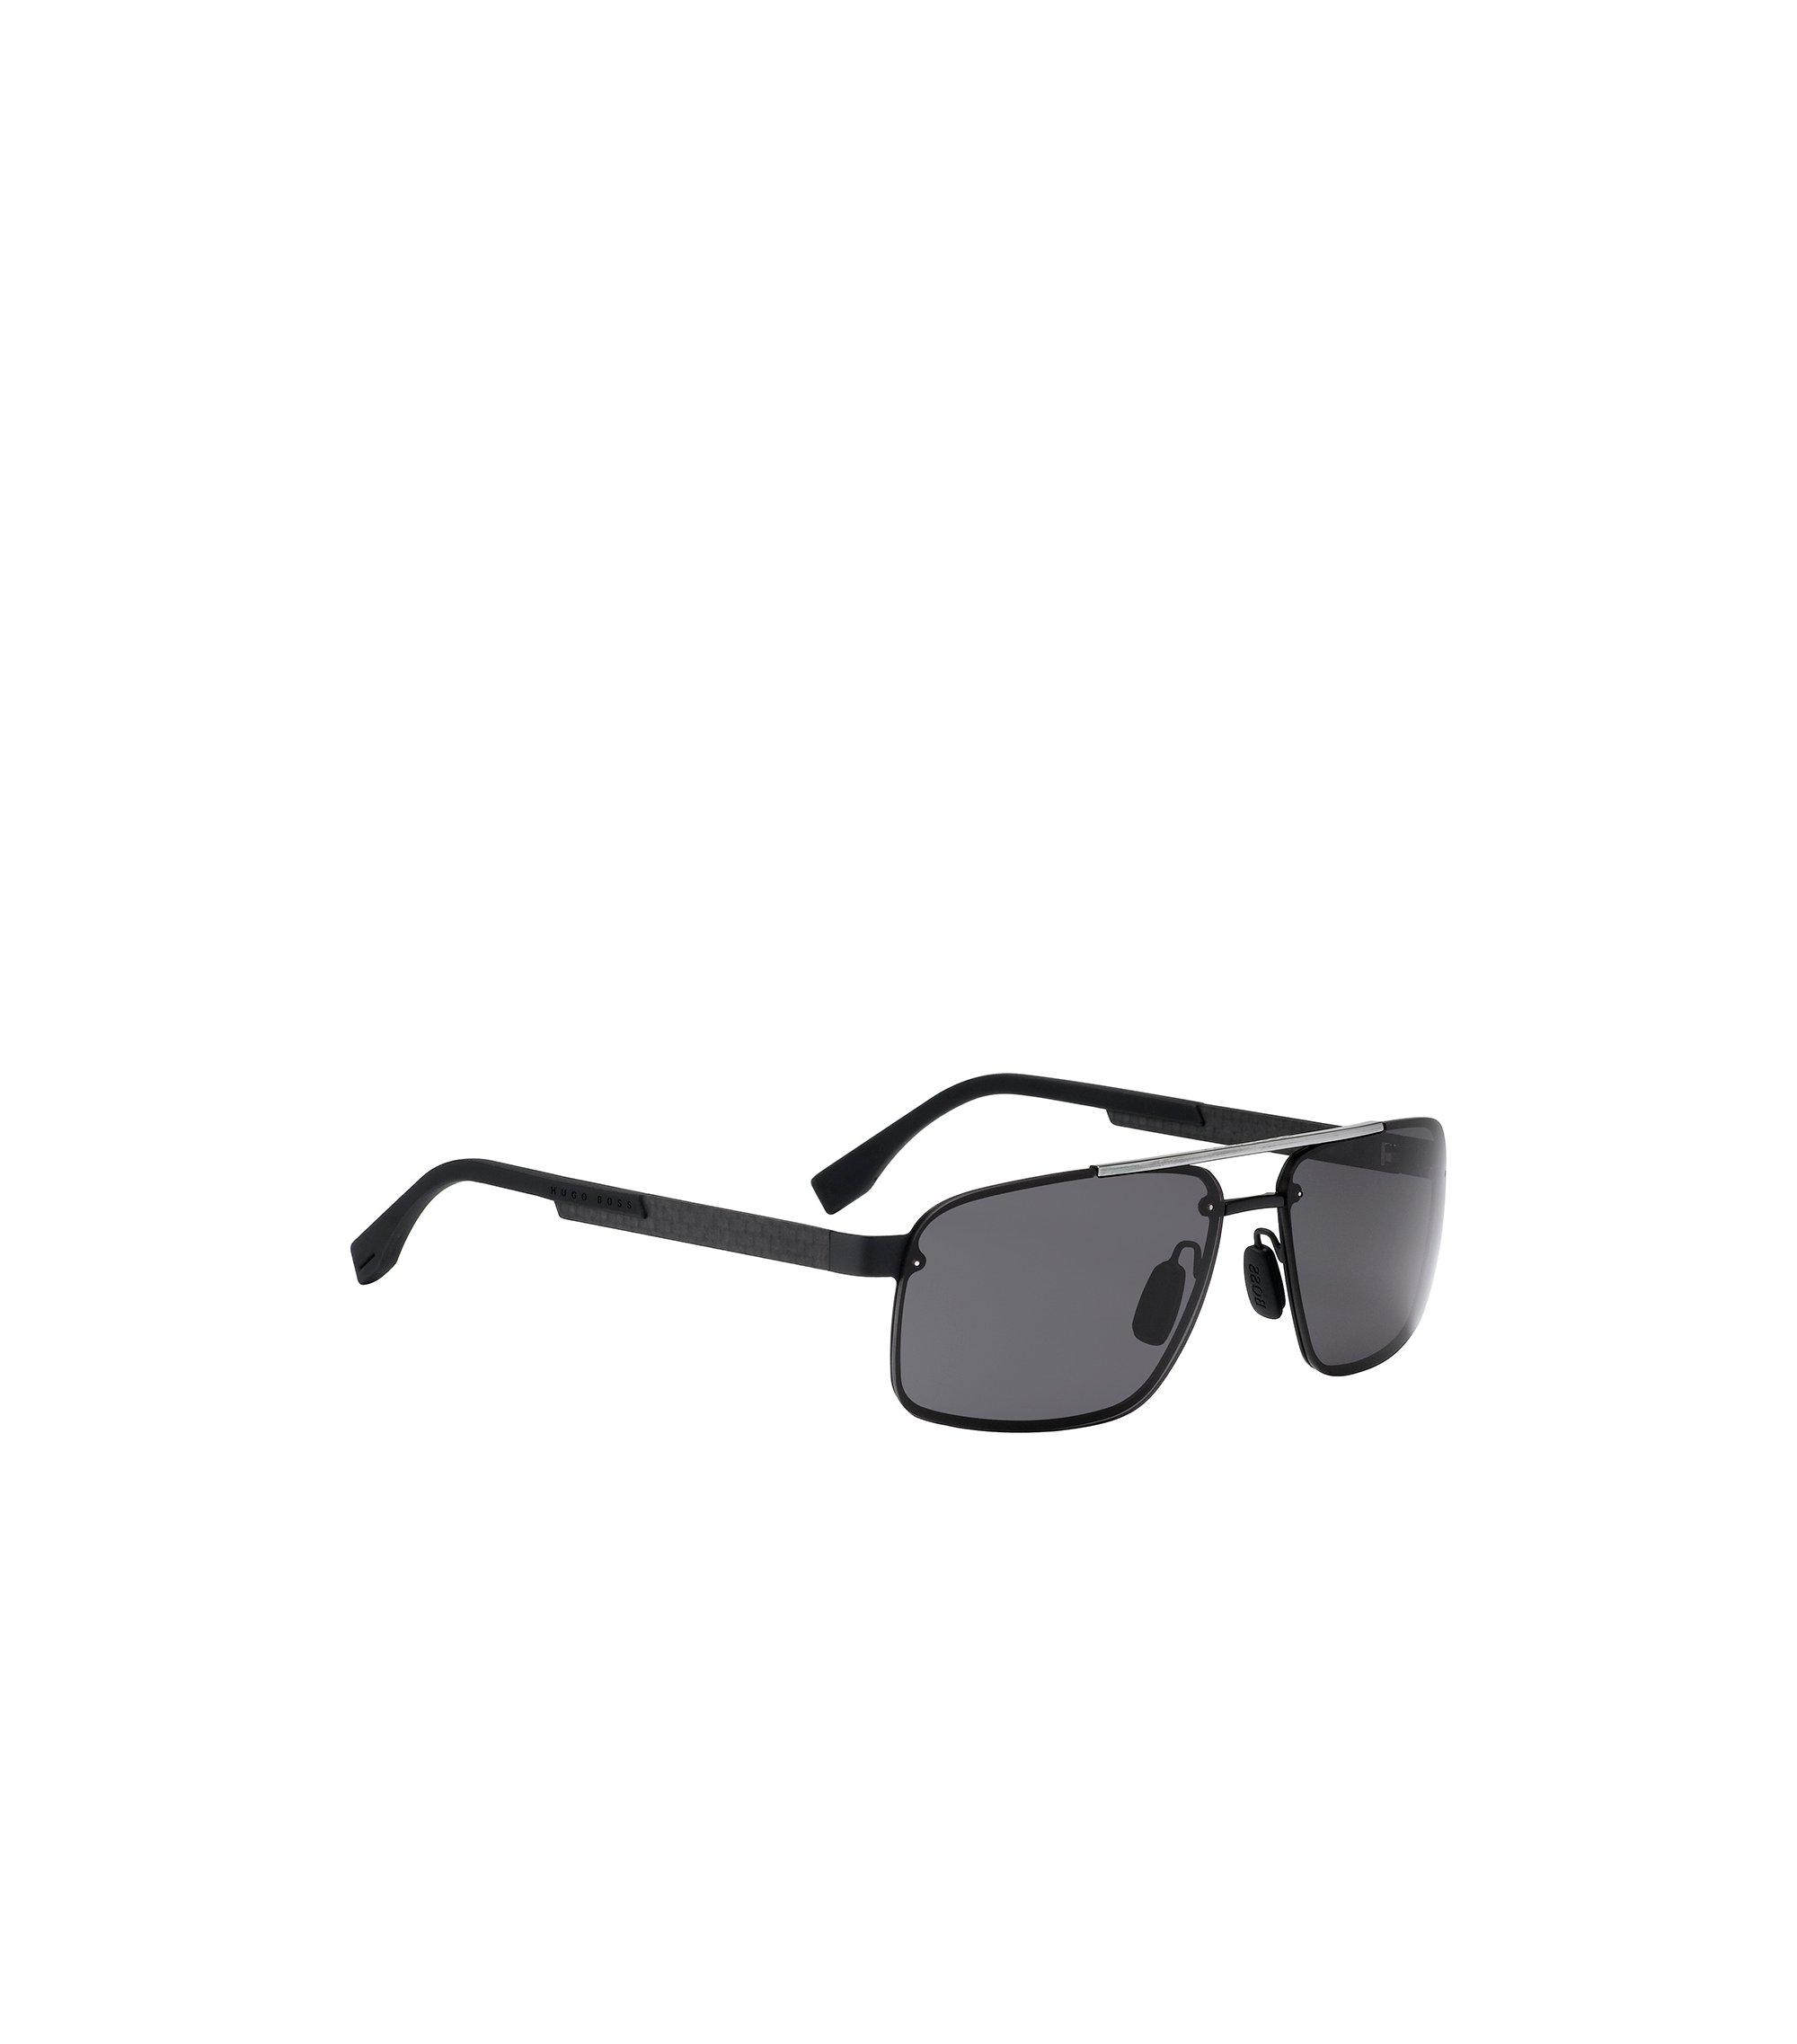 Navigator-Sonnenbrille mit schwarzer Metall-Fassung: 'BOSS 0773/S', Assorted-Pre-Pack